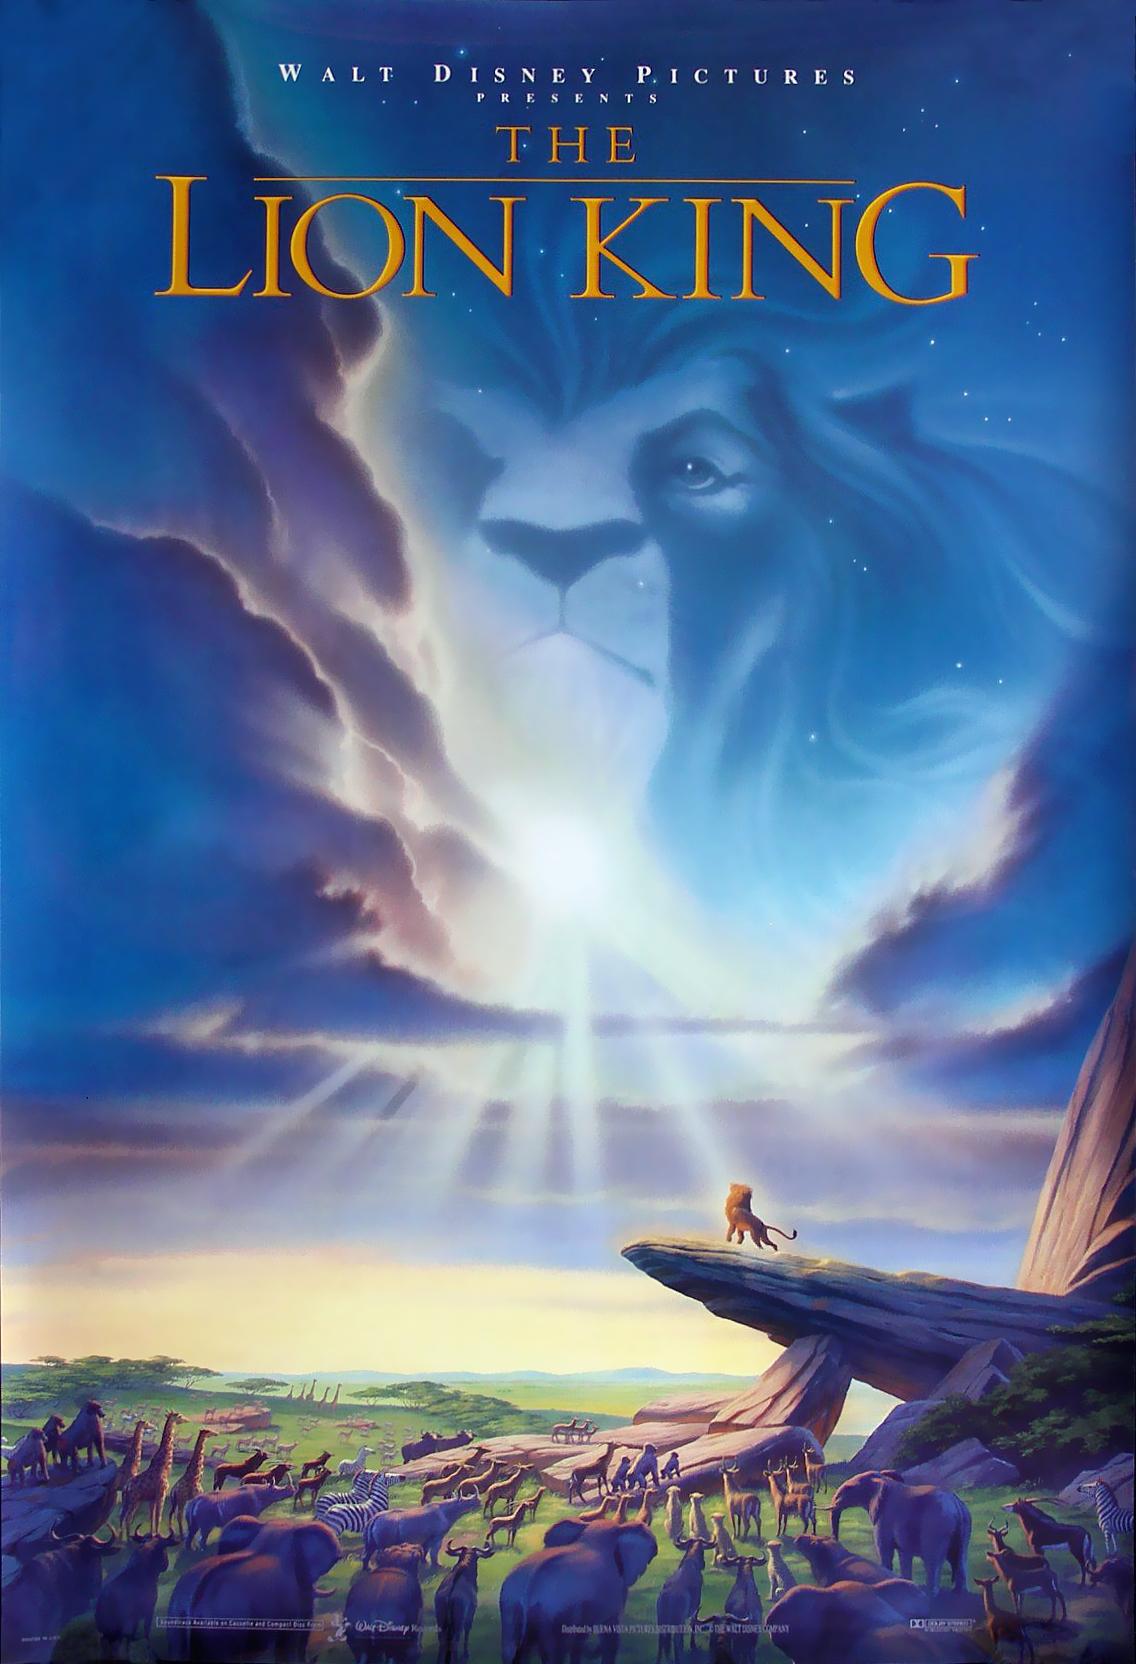 The_lion_king_poster.jpg